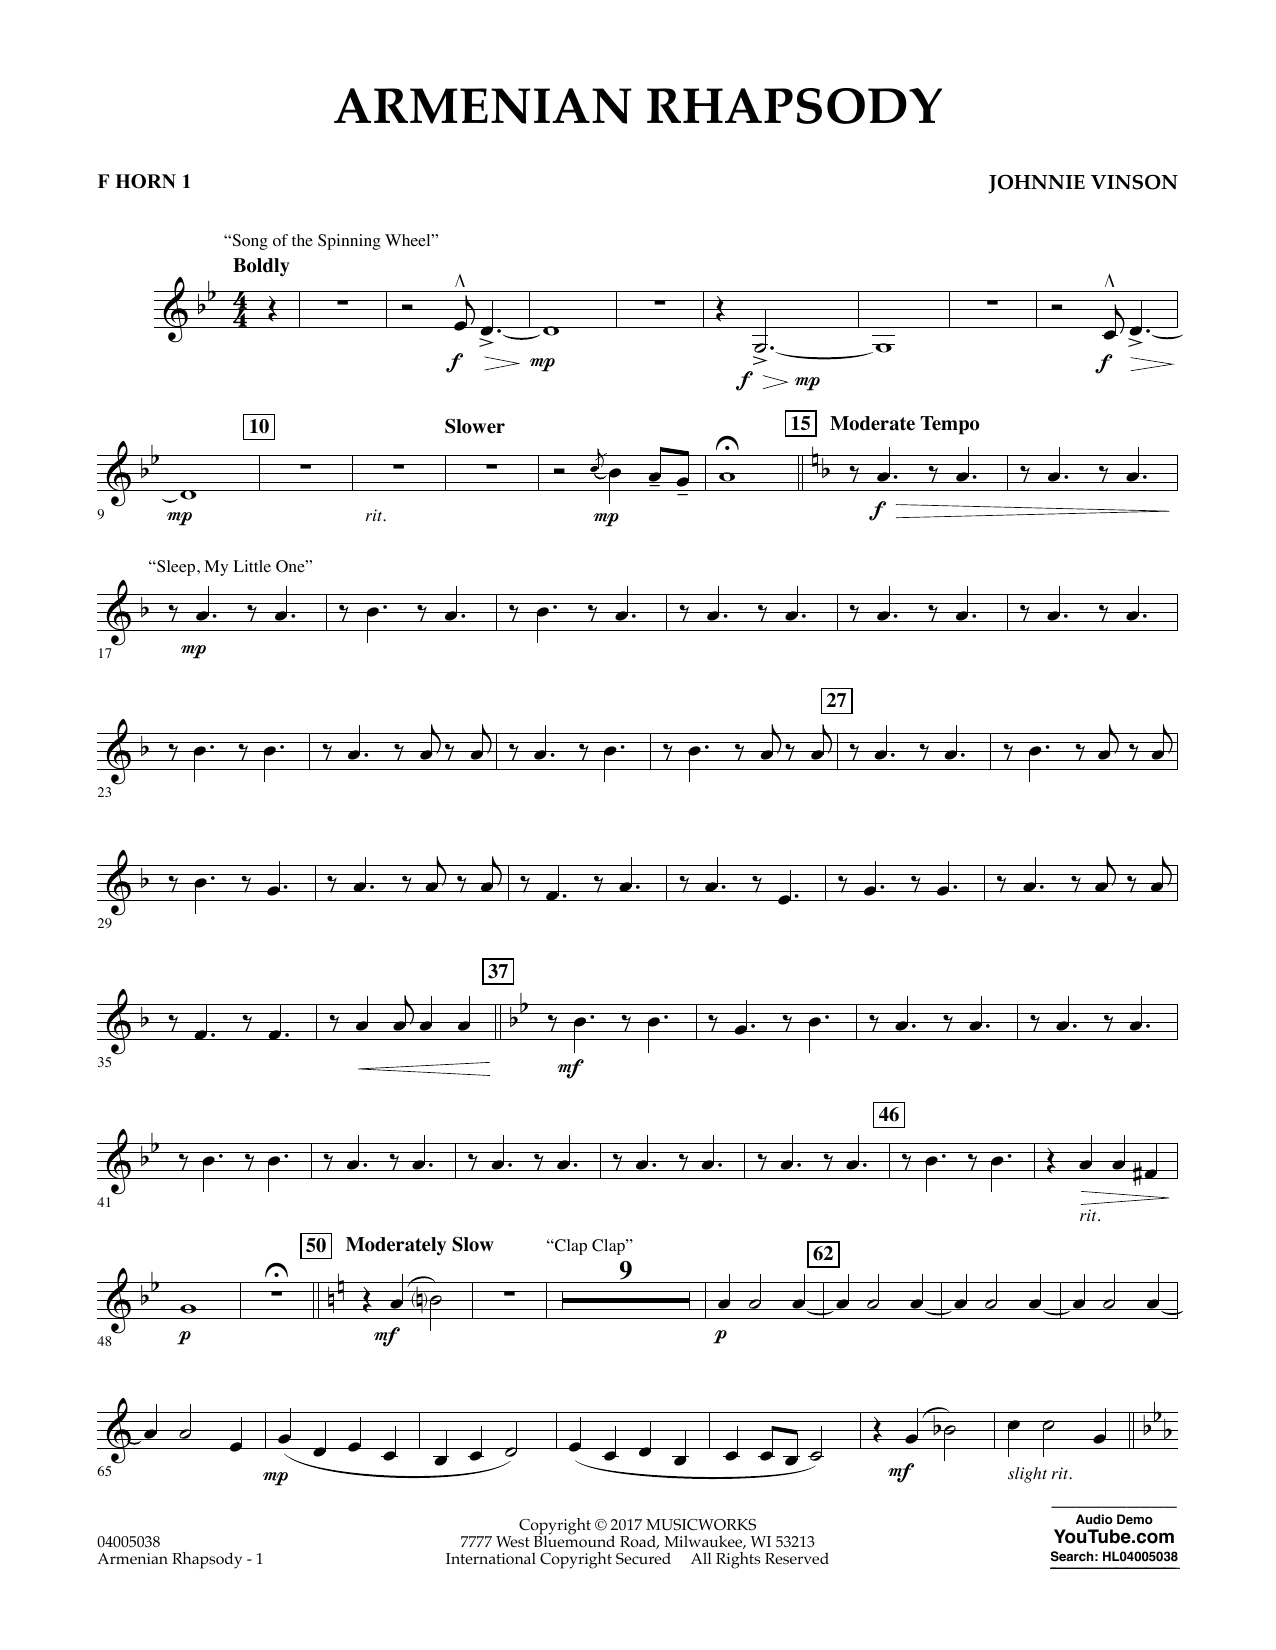 Armenian Rhapsody - F Horn 1 Sheet Music